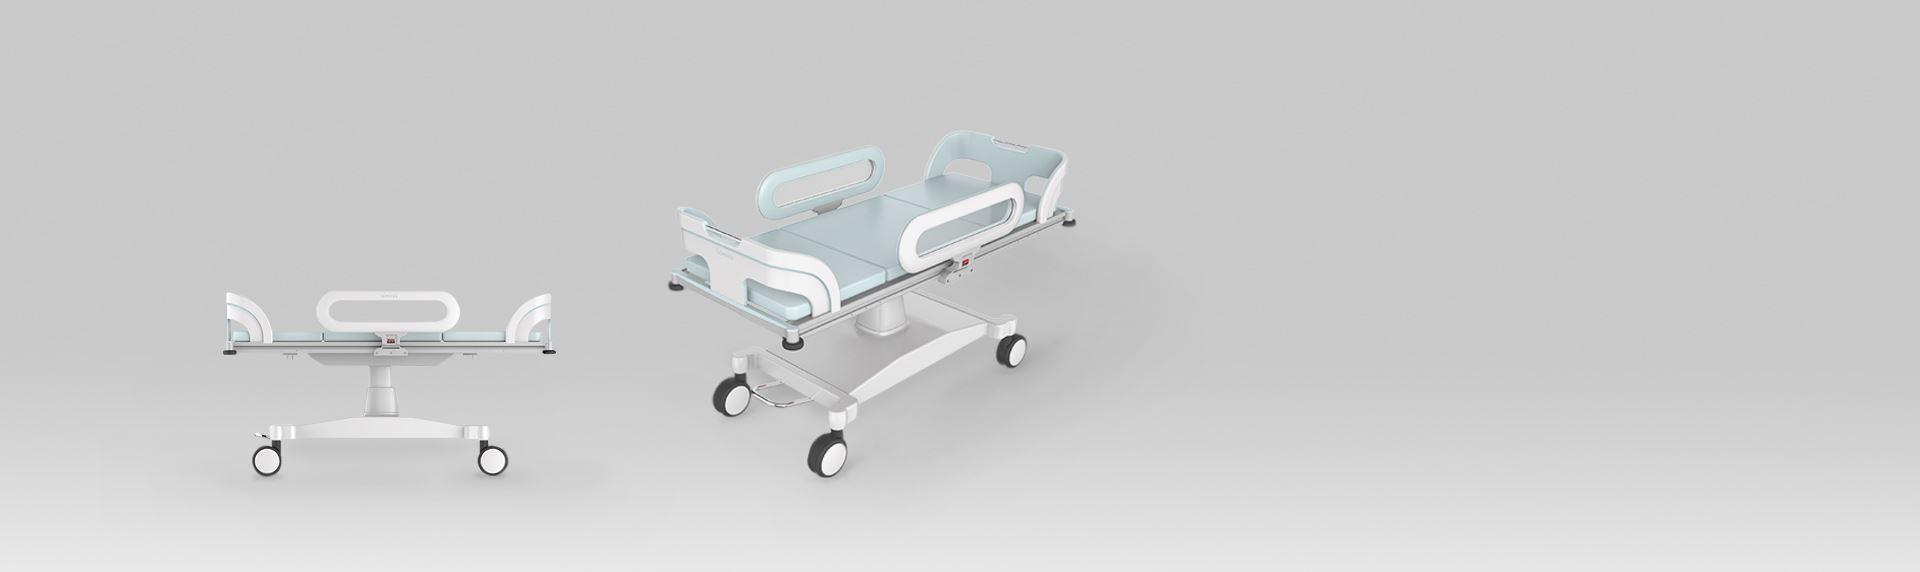 SSC设计-婴儿转换车 ICU护理床